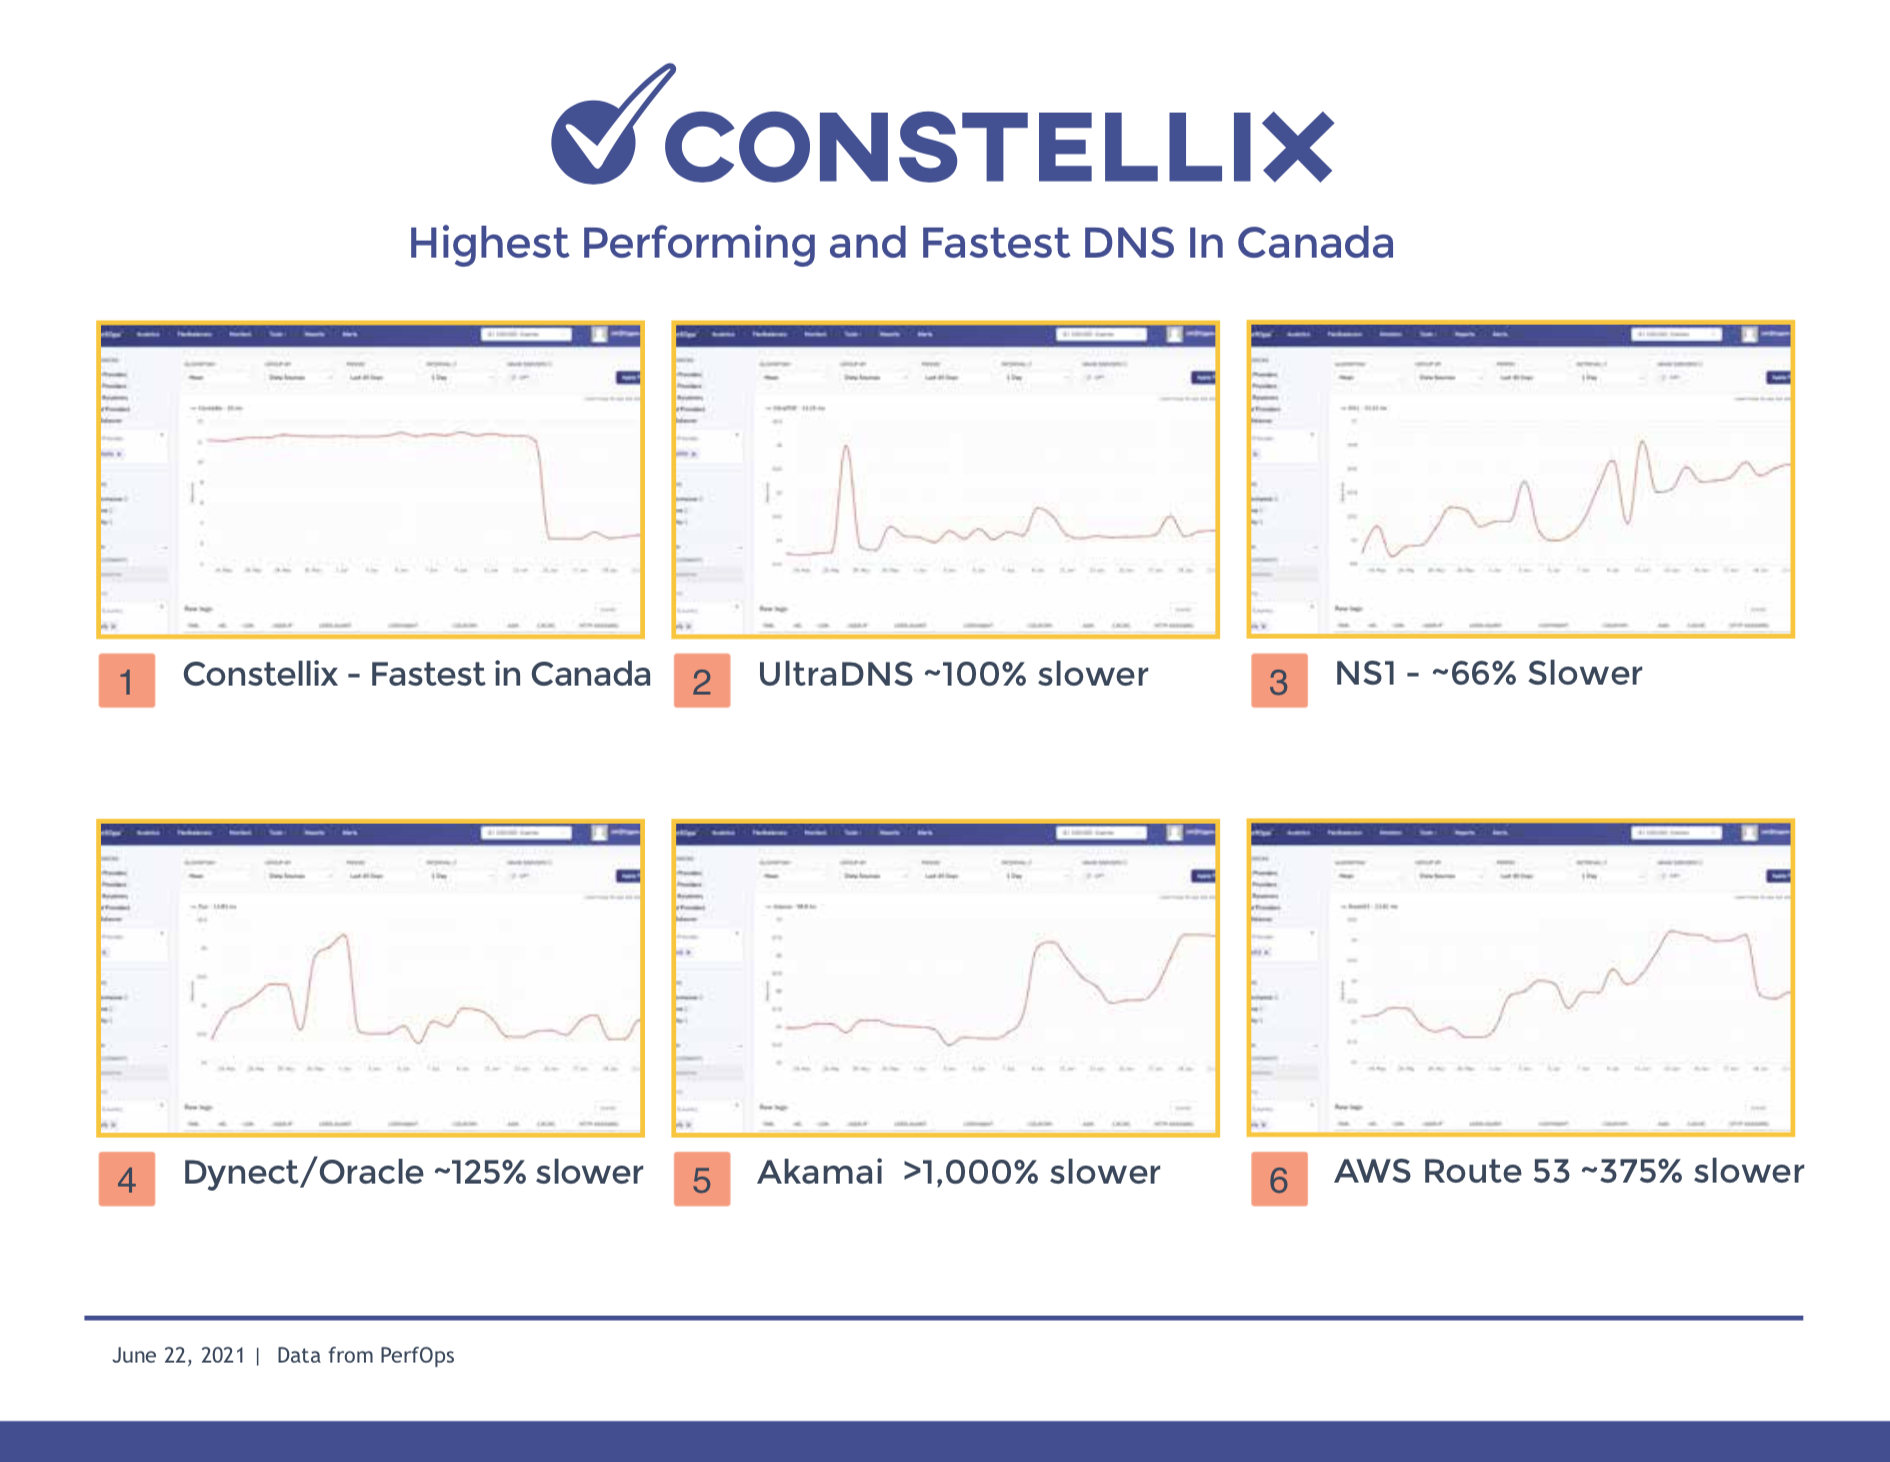 DNS Speed Test Comparison - AWS Route 53 - Akamai - Dynect / Oracle - Ultra DNS - NS1